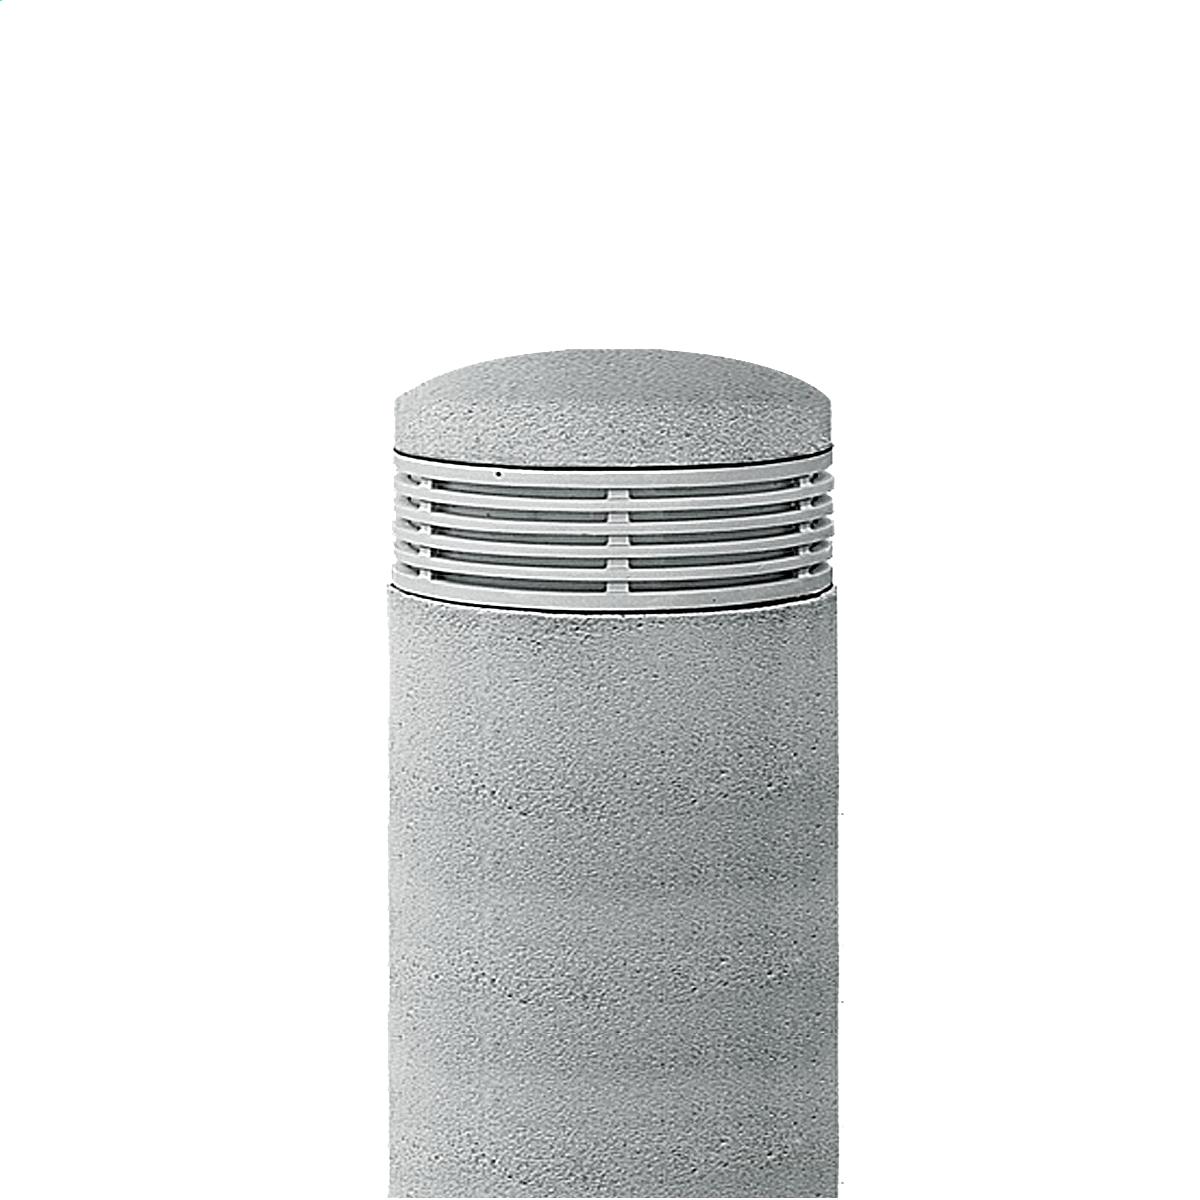 Concrete Bollard - 18